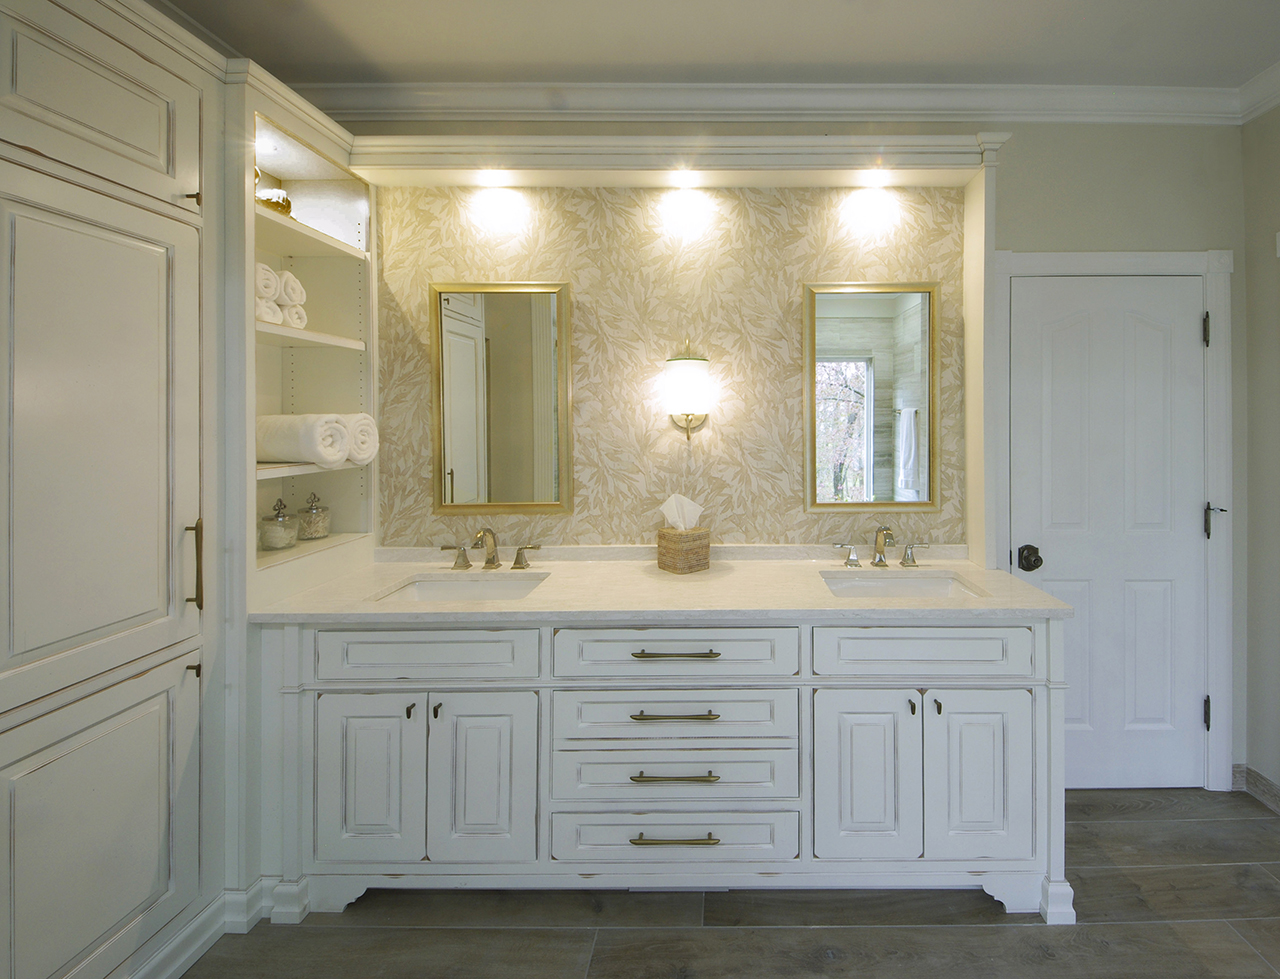 Sara_Lee_Dove Road bathroom #13